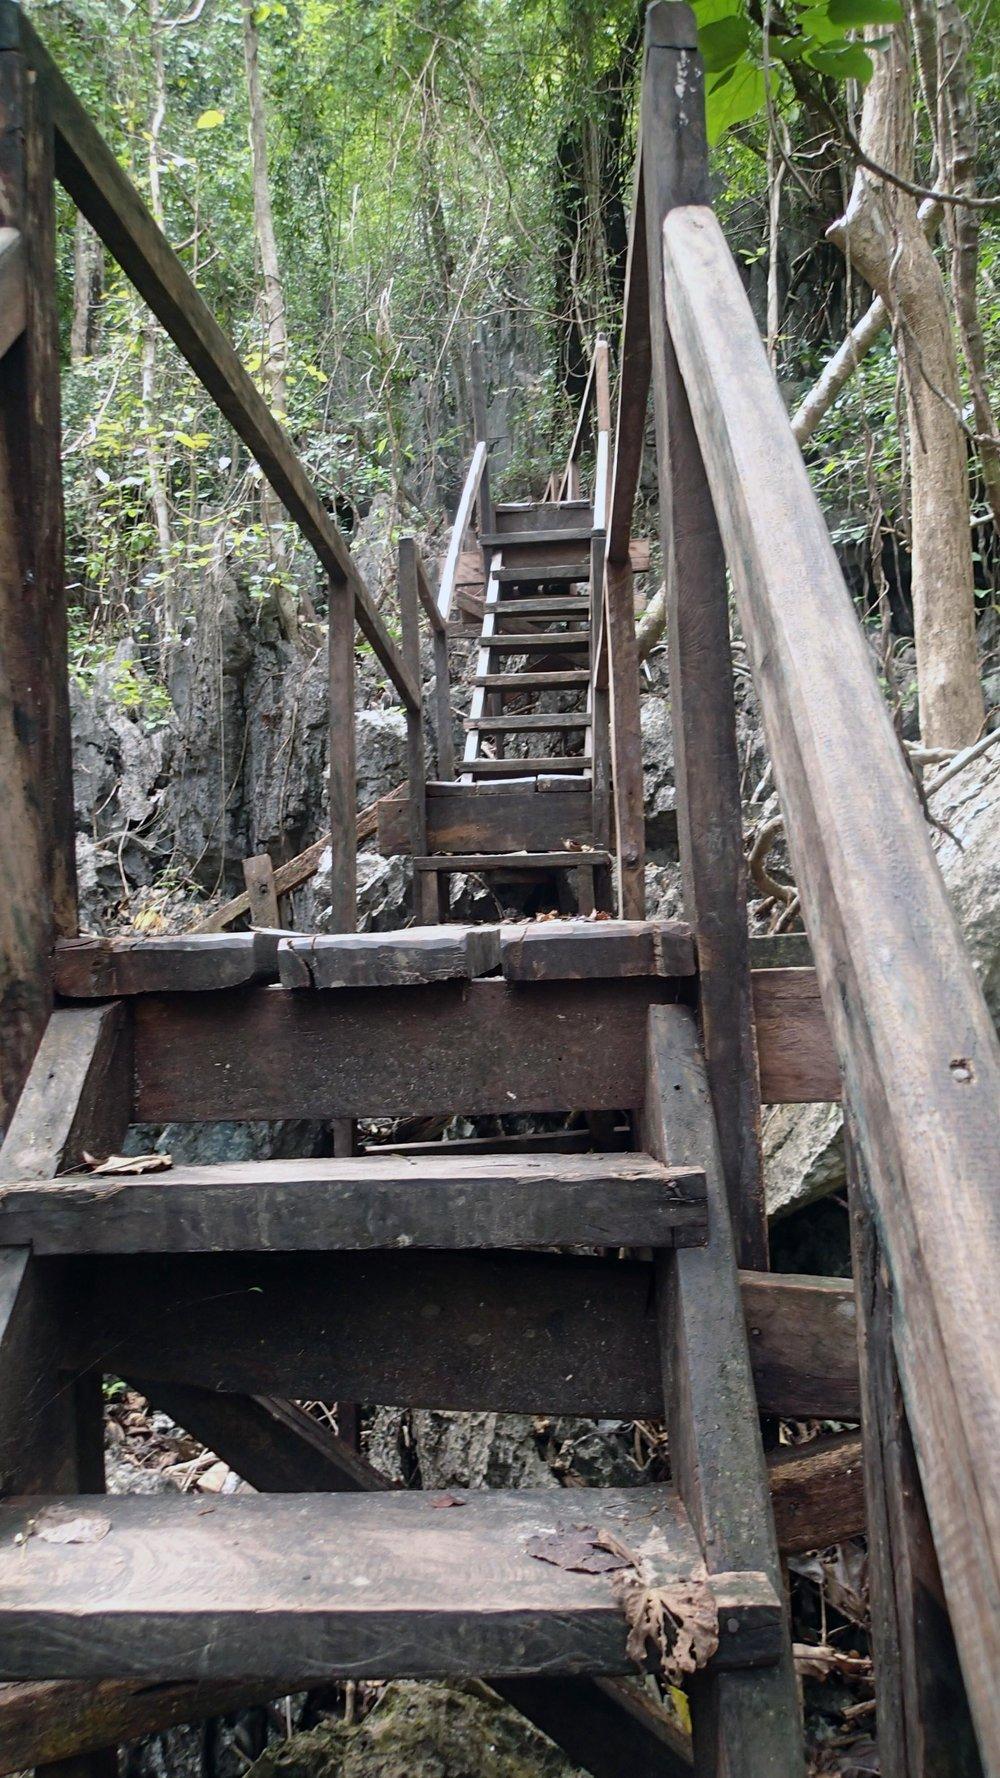 jungle trail 1-18-17.jpg